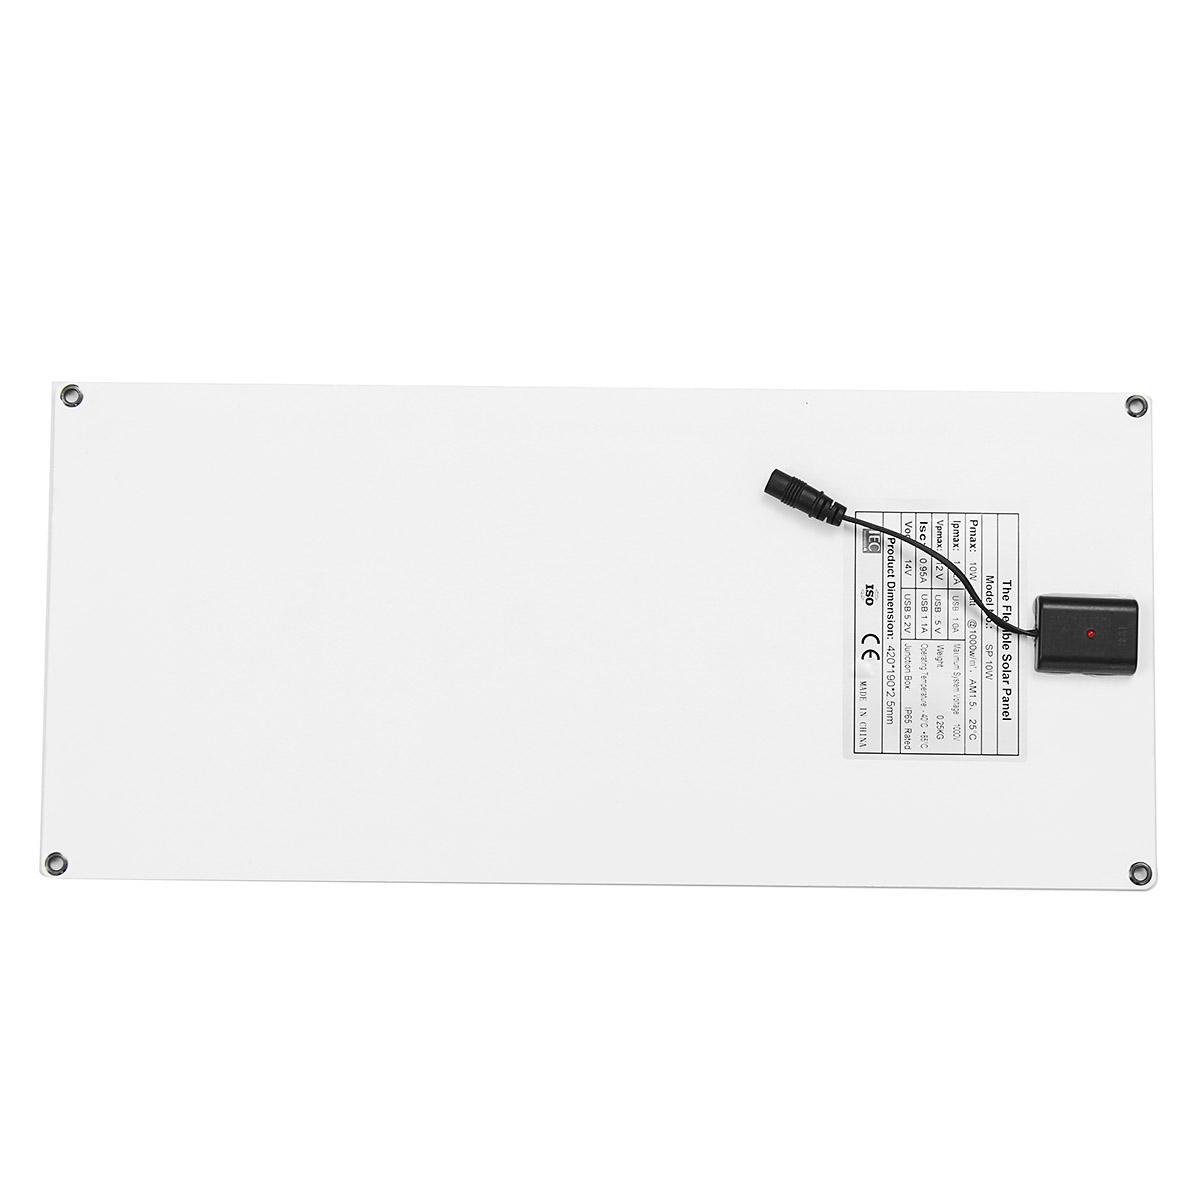 Sp 10w 5v Output 42 19cm Rear Junction Box Solar Panel